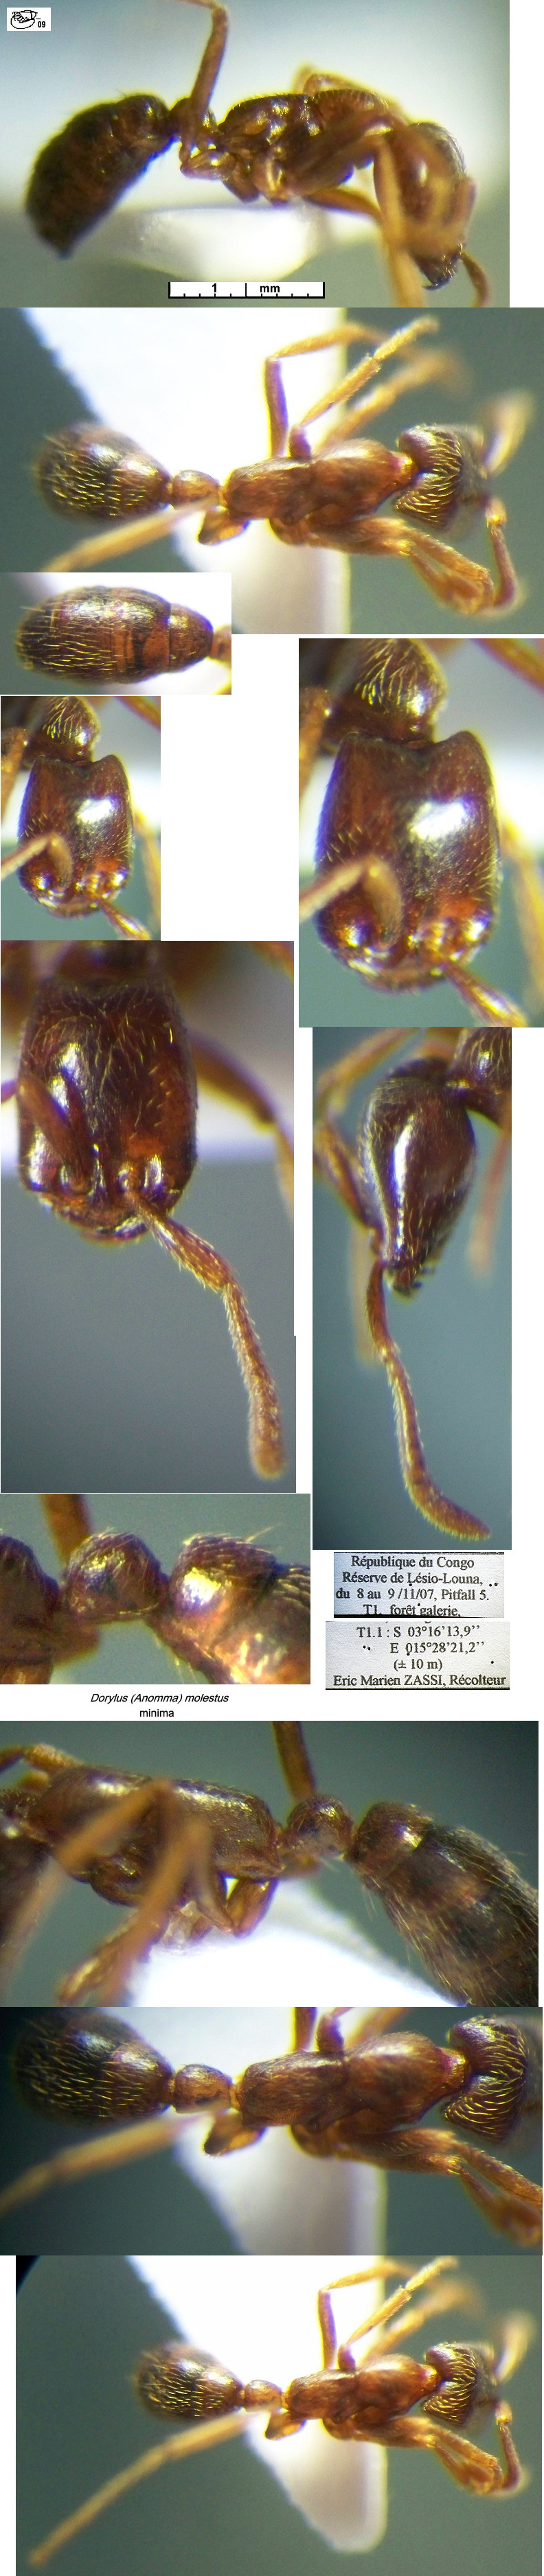 {Dorylus molestus minima}